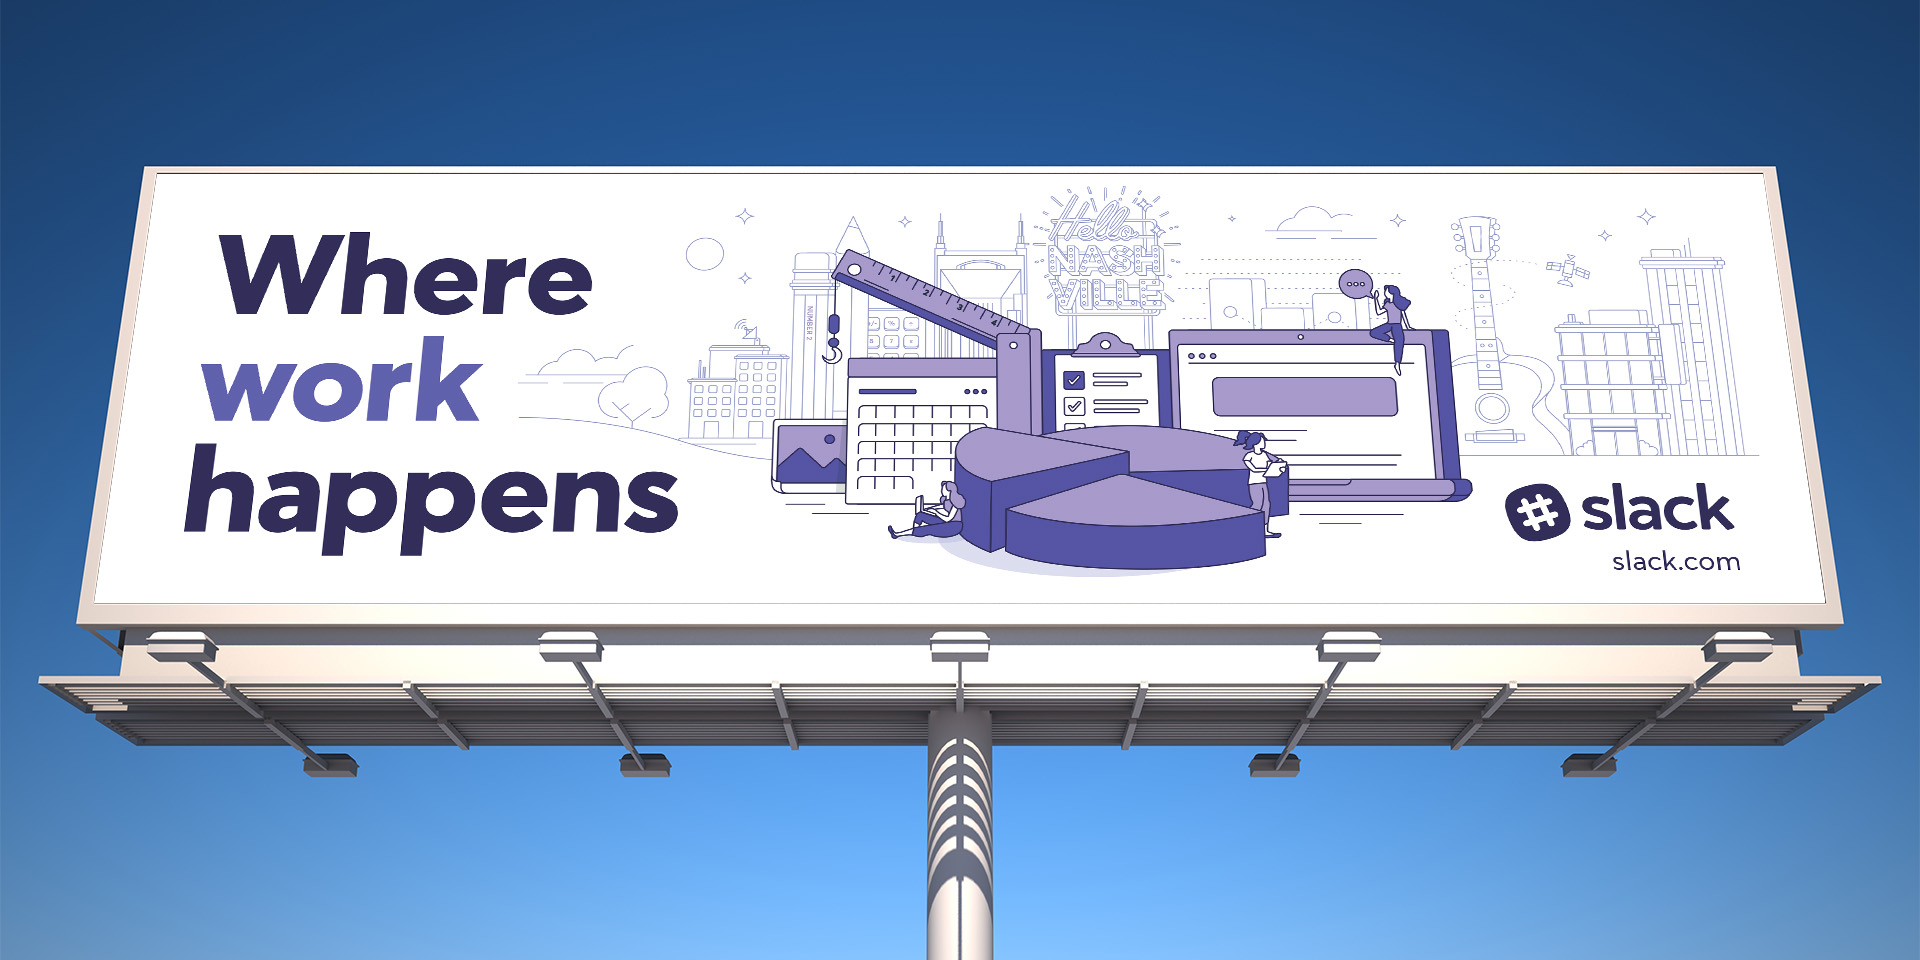 Slack Where work happens nashville billboard design with custom illustrations specific to the city.